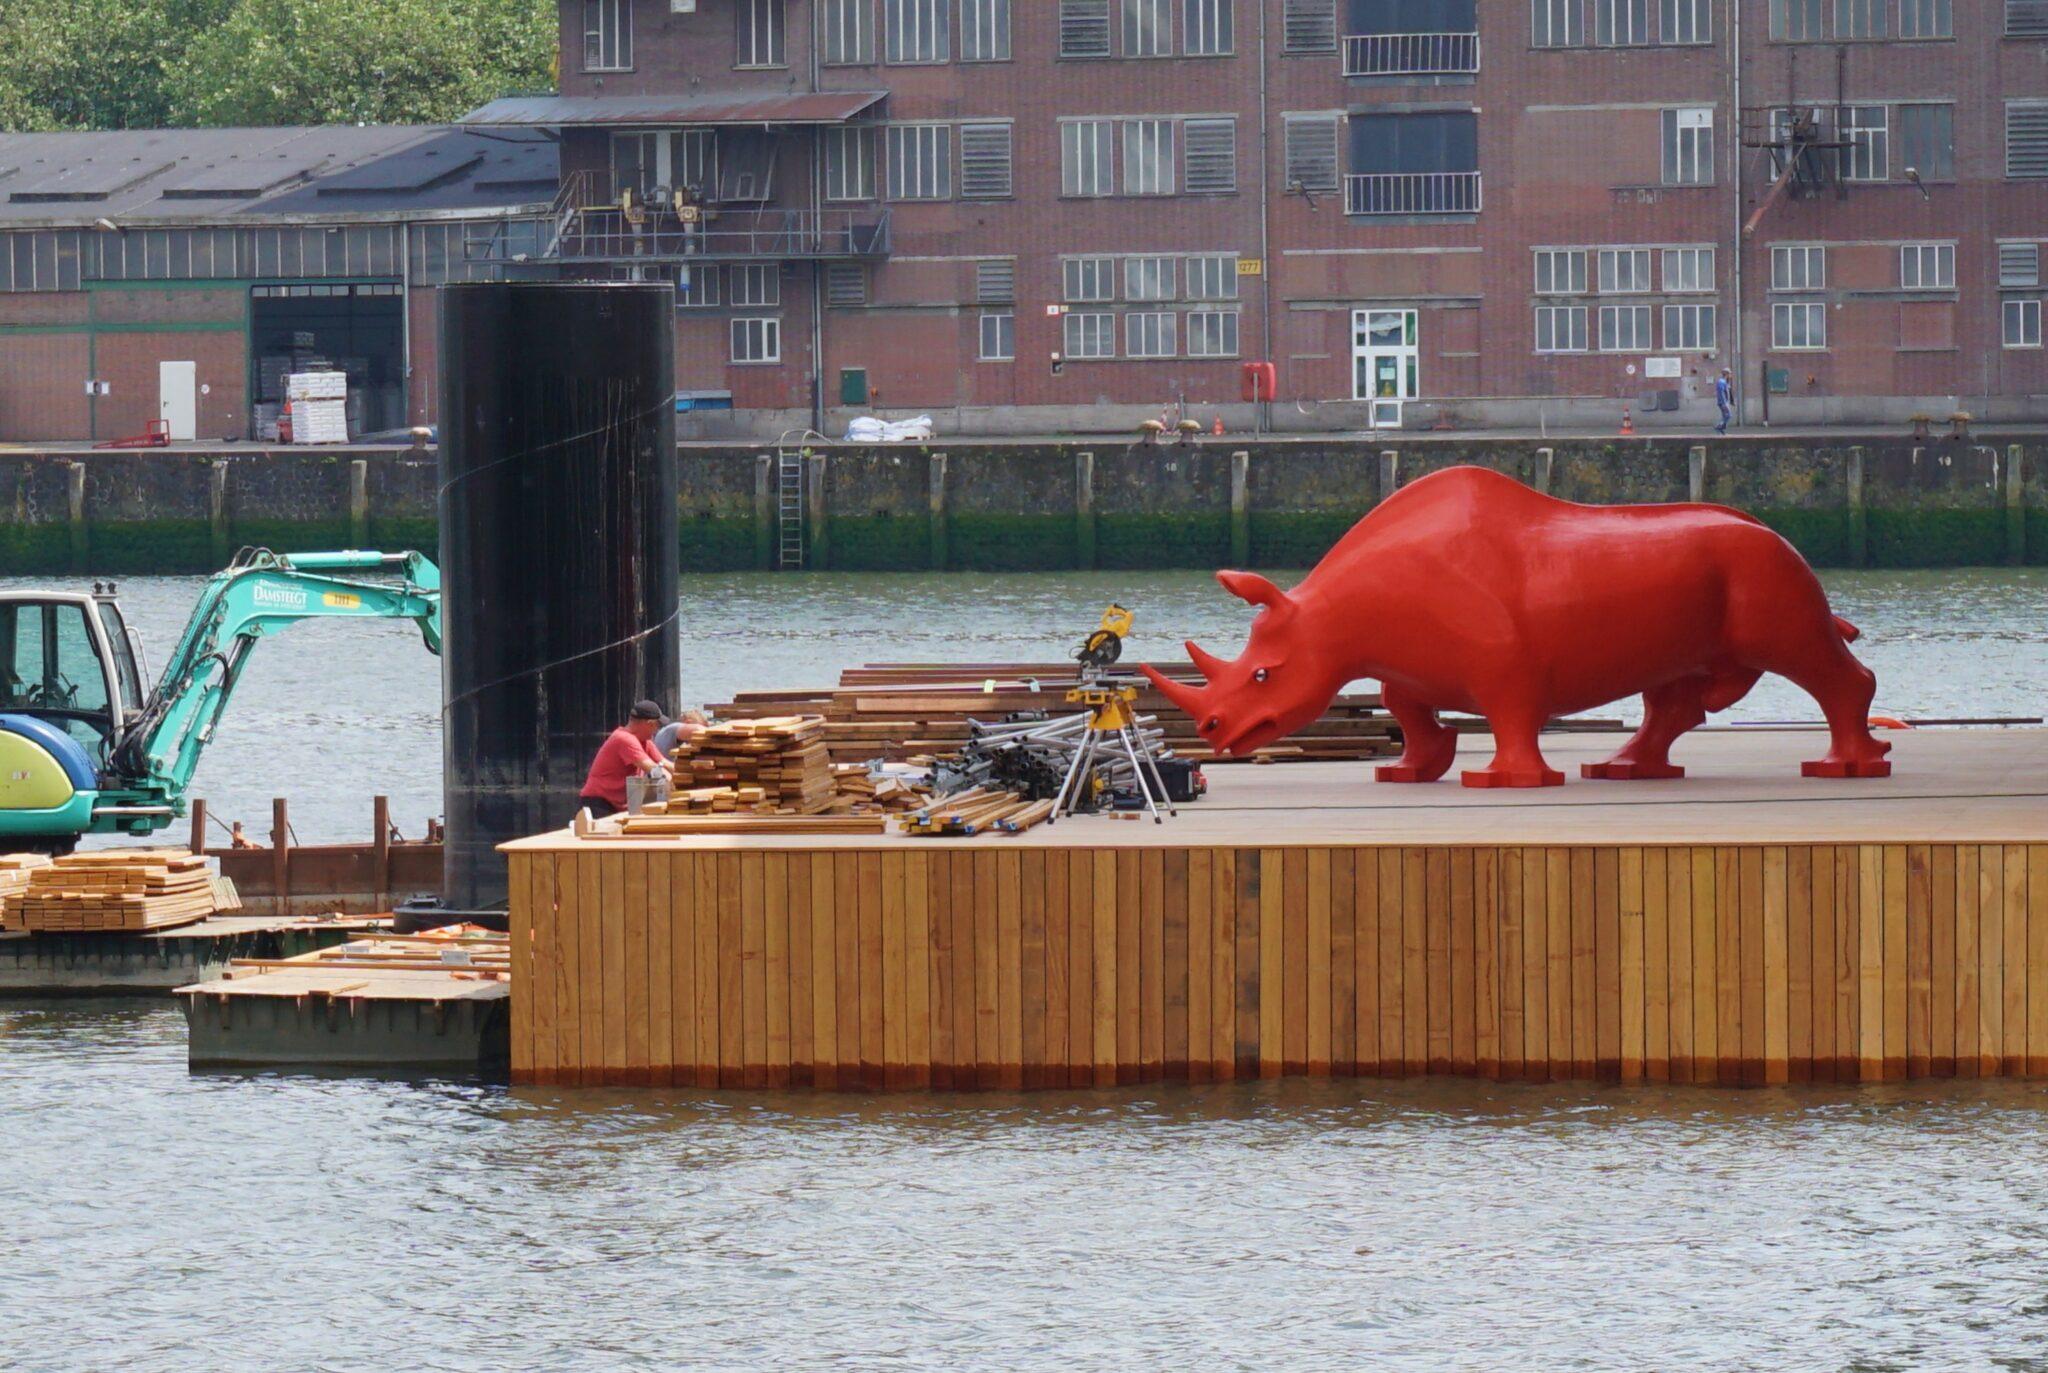 neushoorn Joep van Lieshout